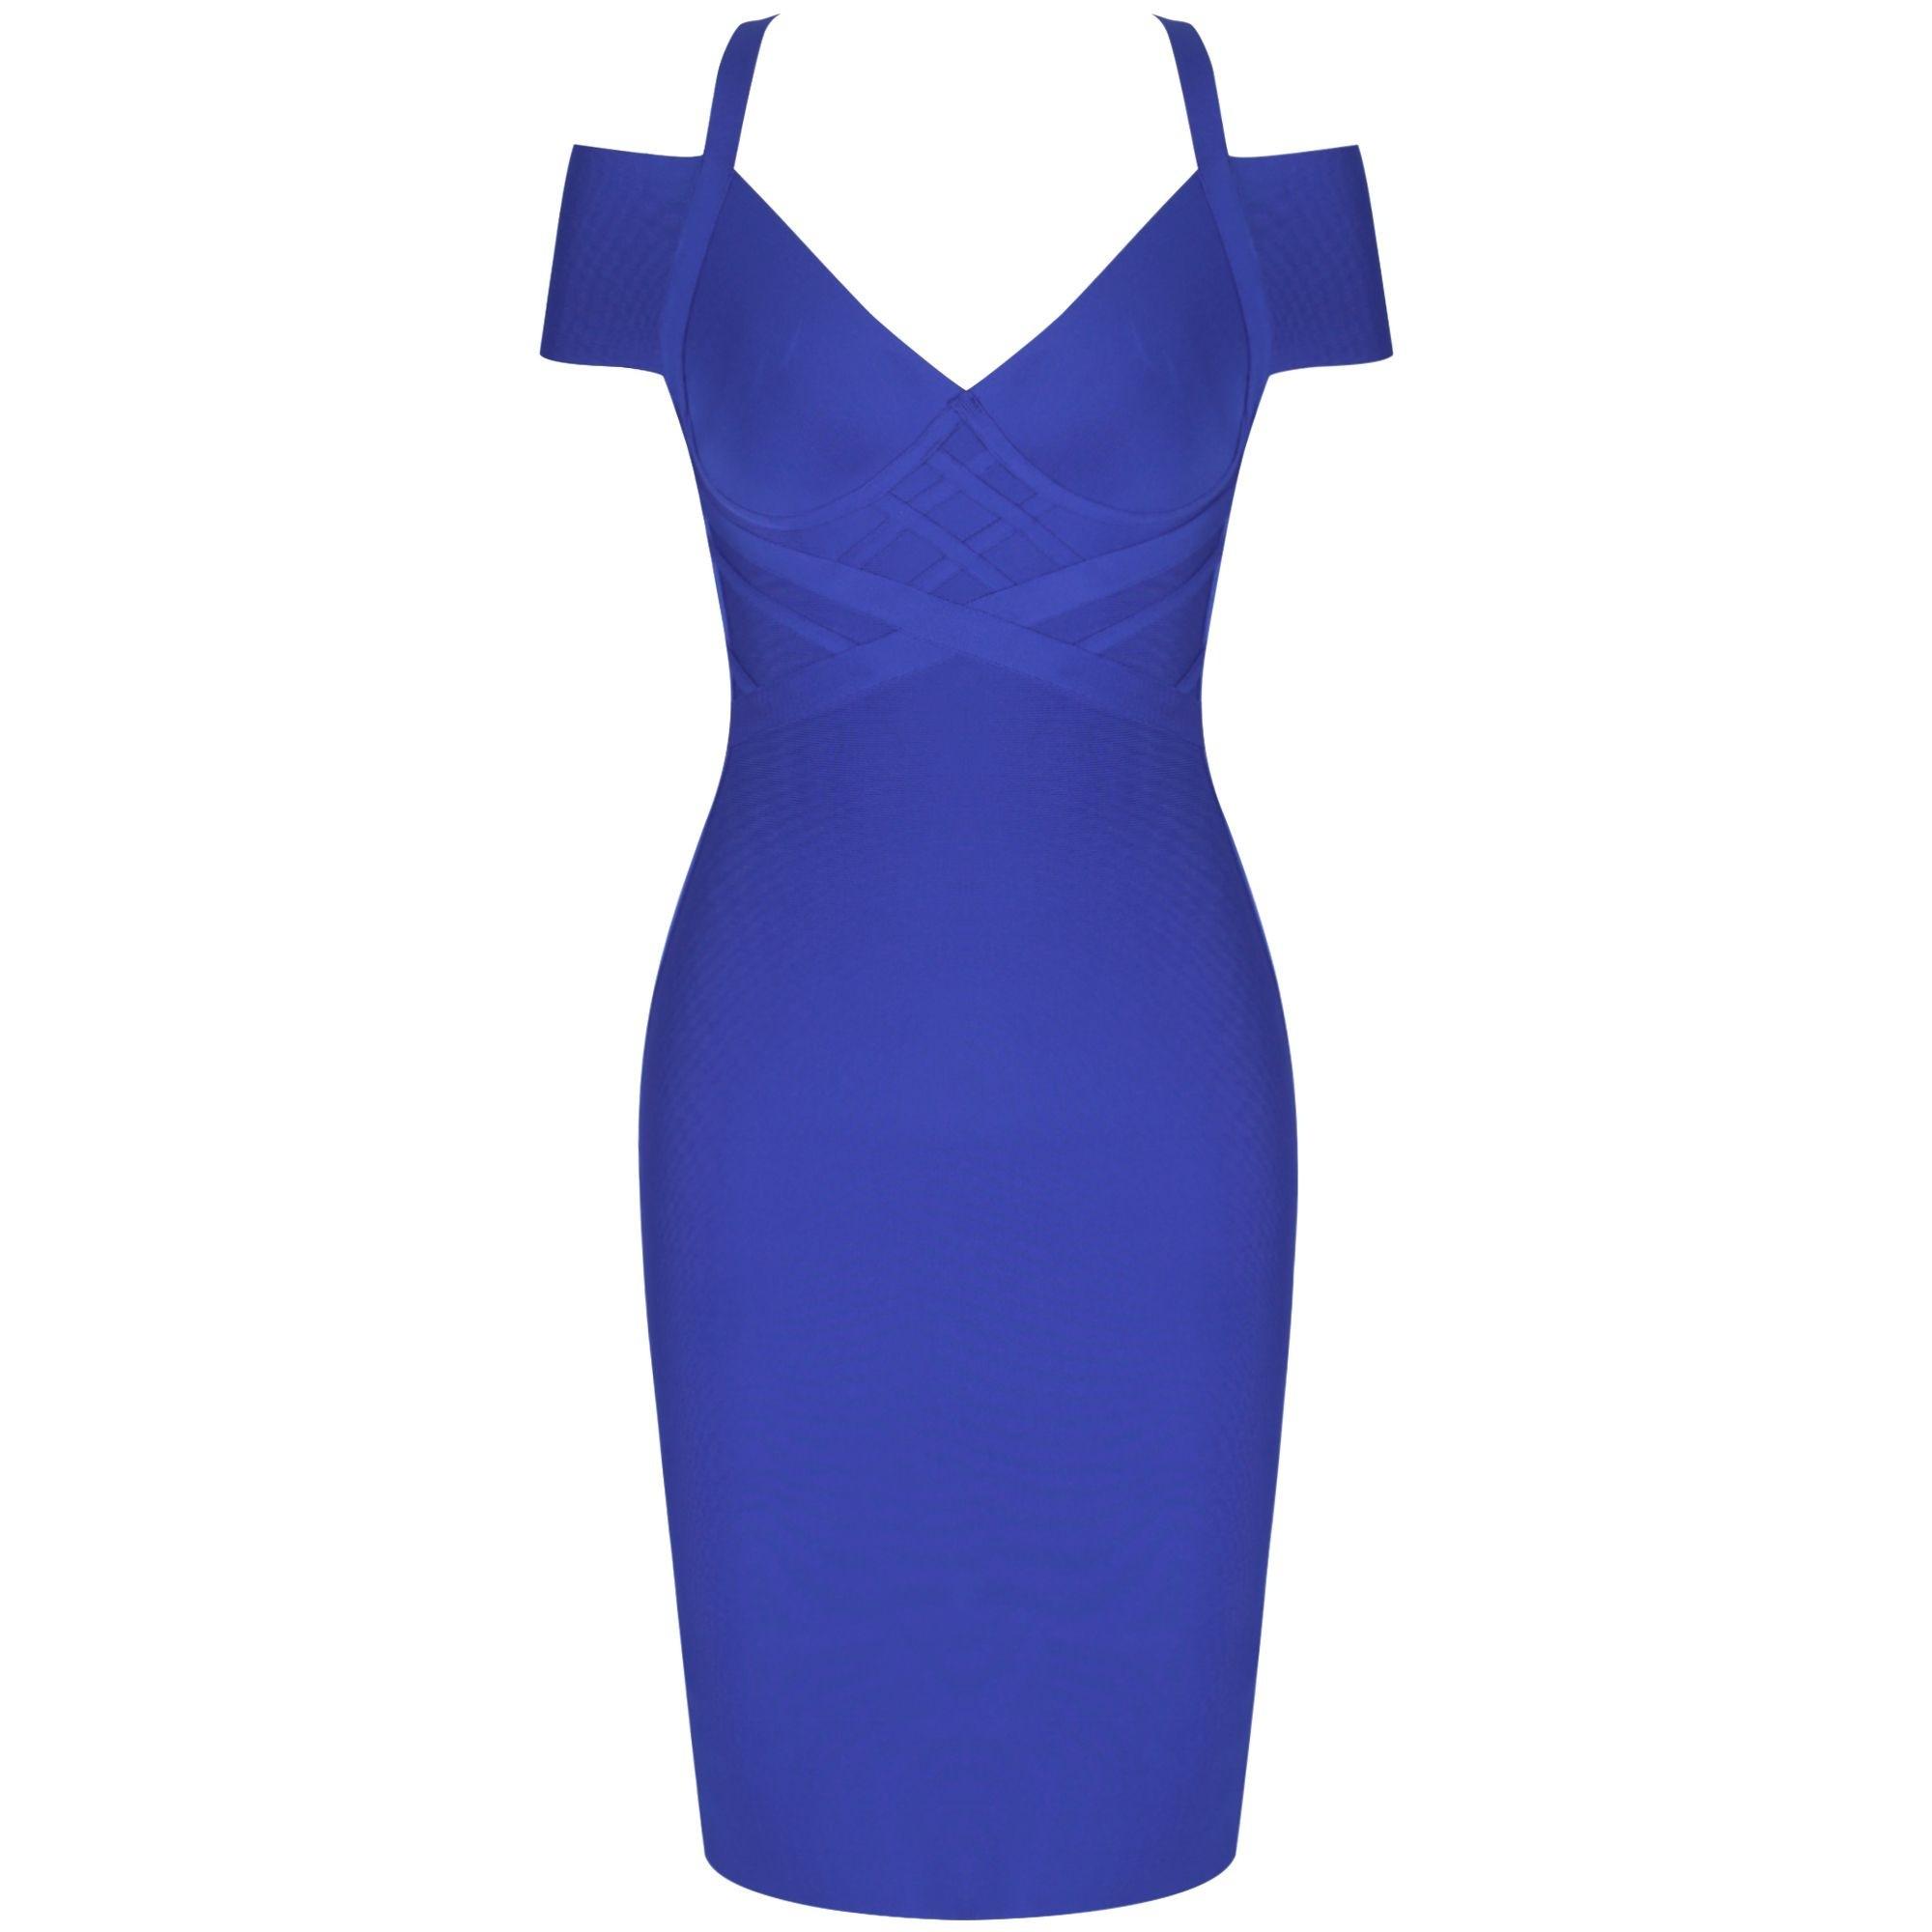 Roya Blue Striped Over Knee Short Sleeve Strapy Bandage Dress PF19089-Roya-Blue